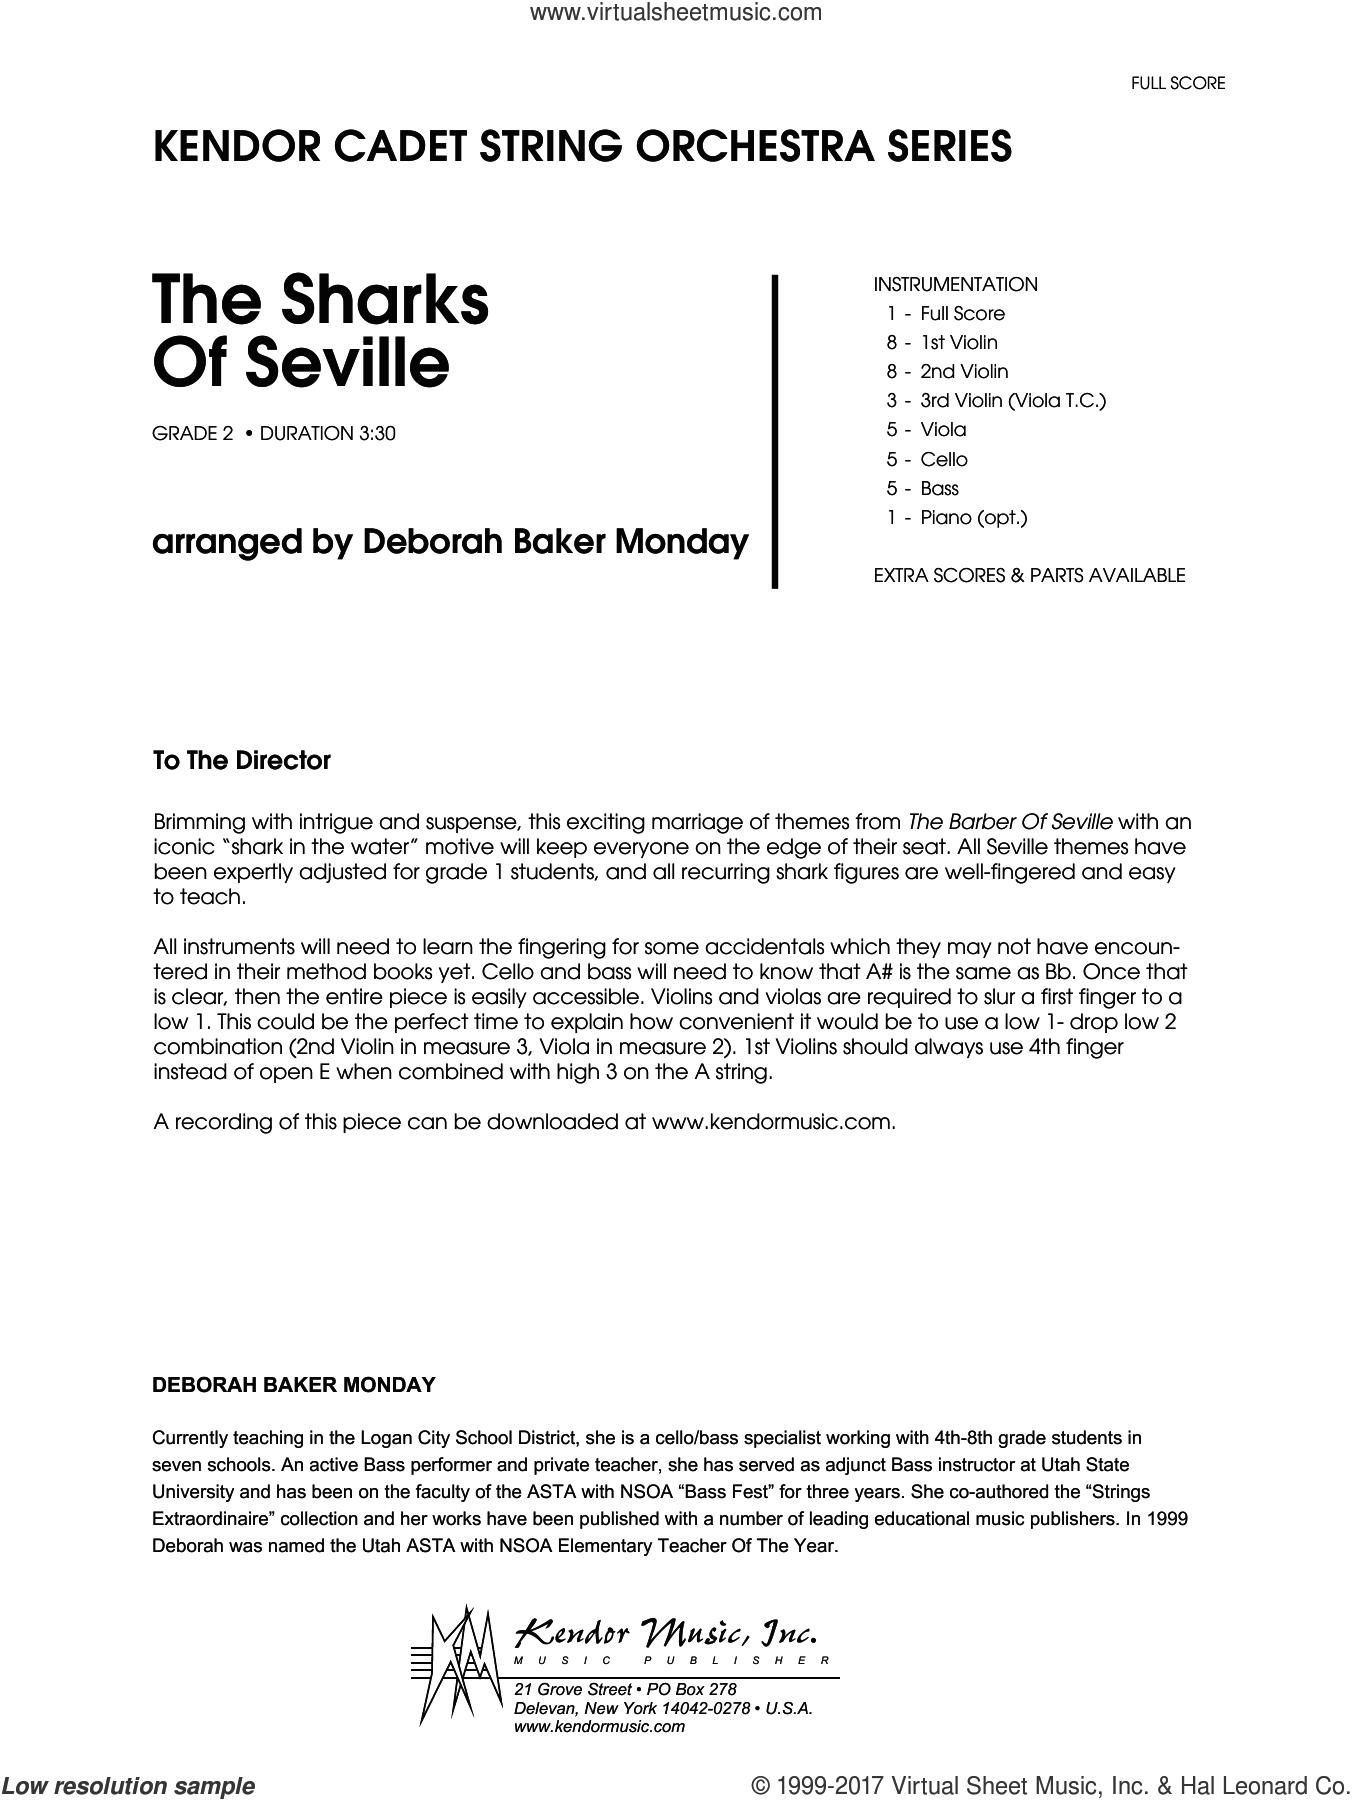 The Sharks Of Seville (COMPLETE) sheet music for orchestra by Deborah Baker Monday, intermediate skill level